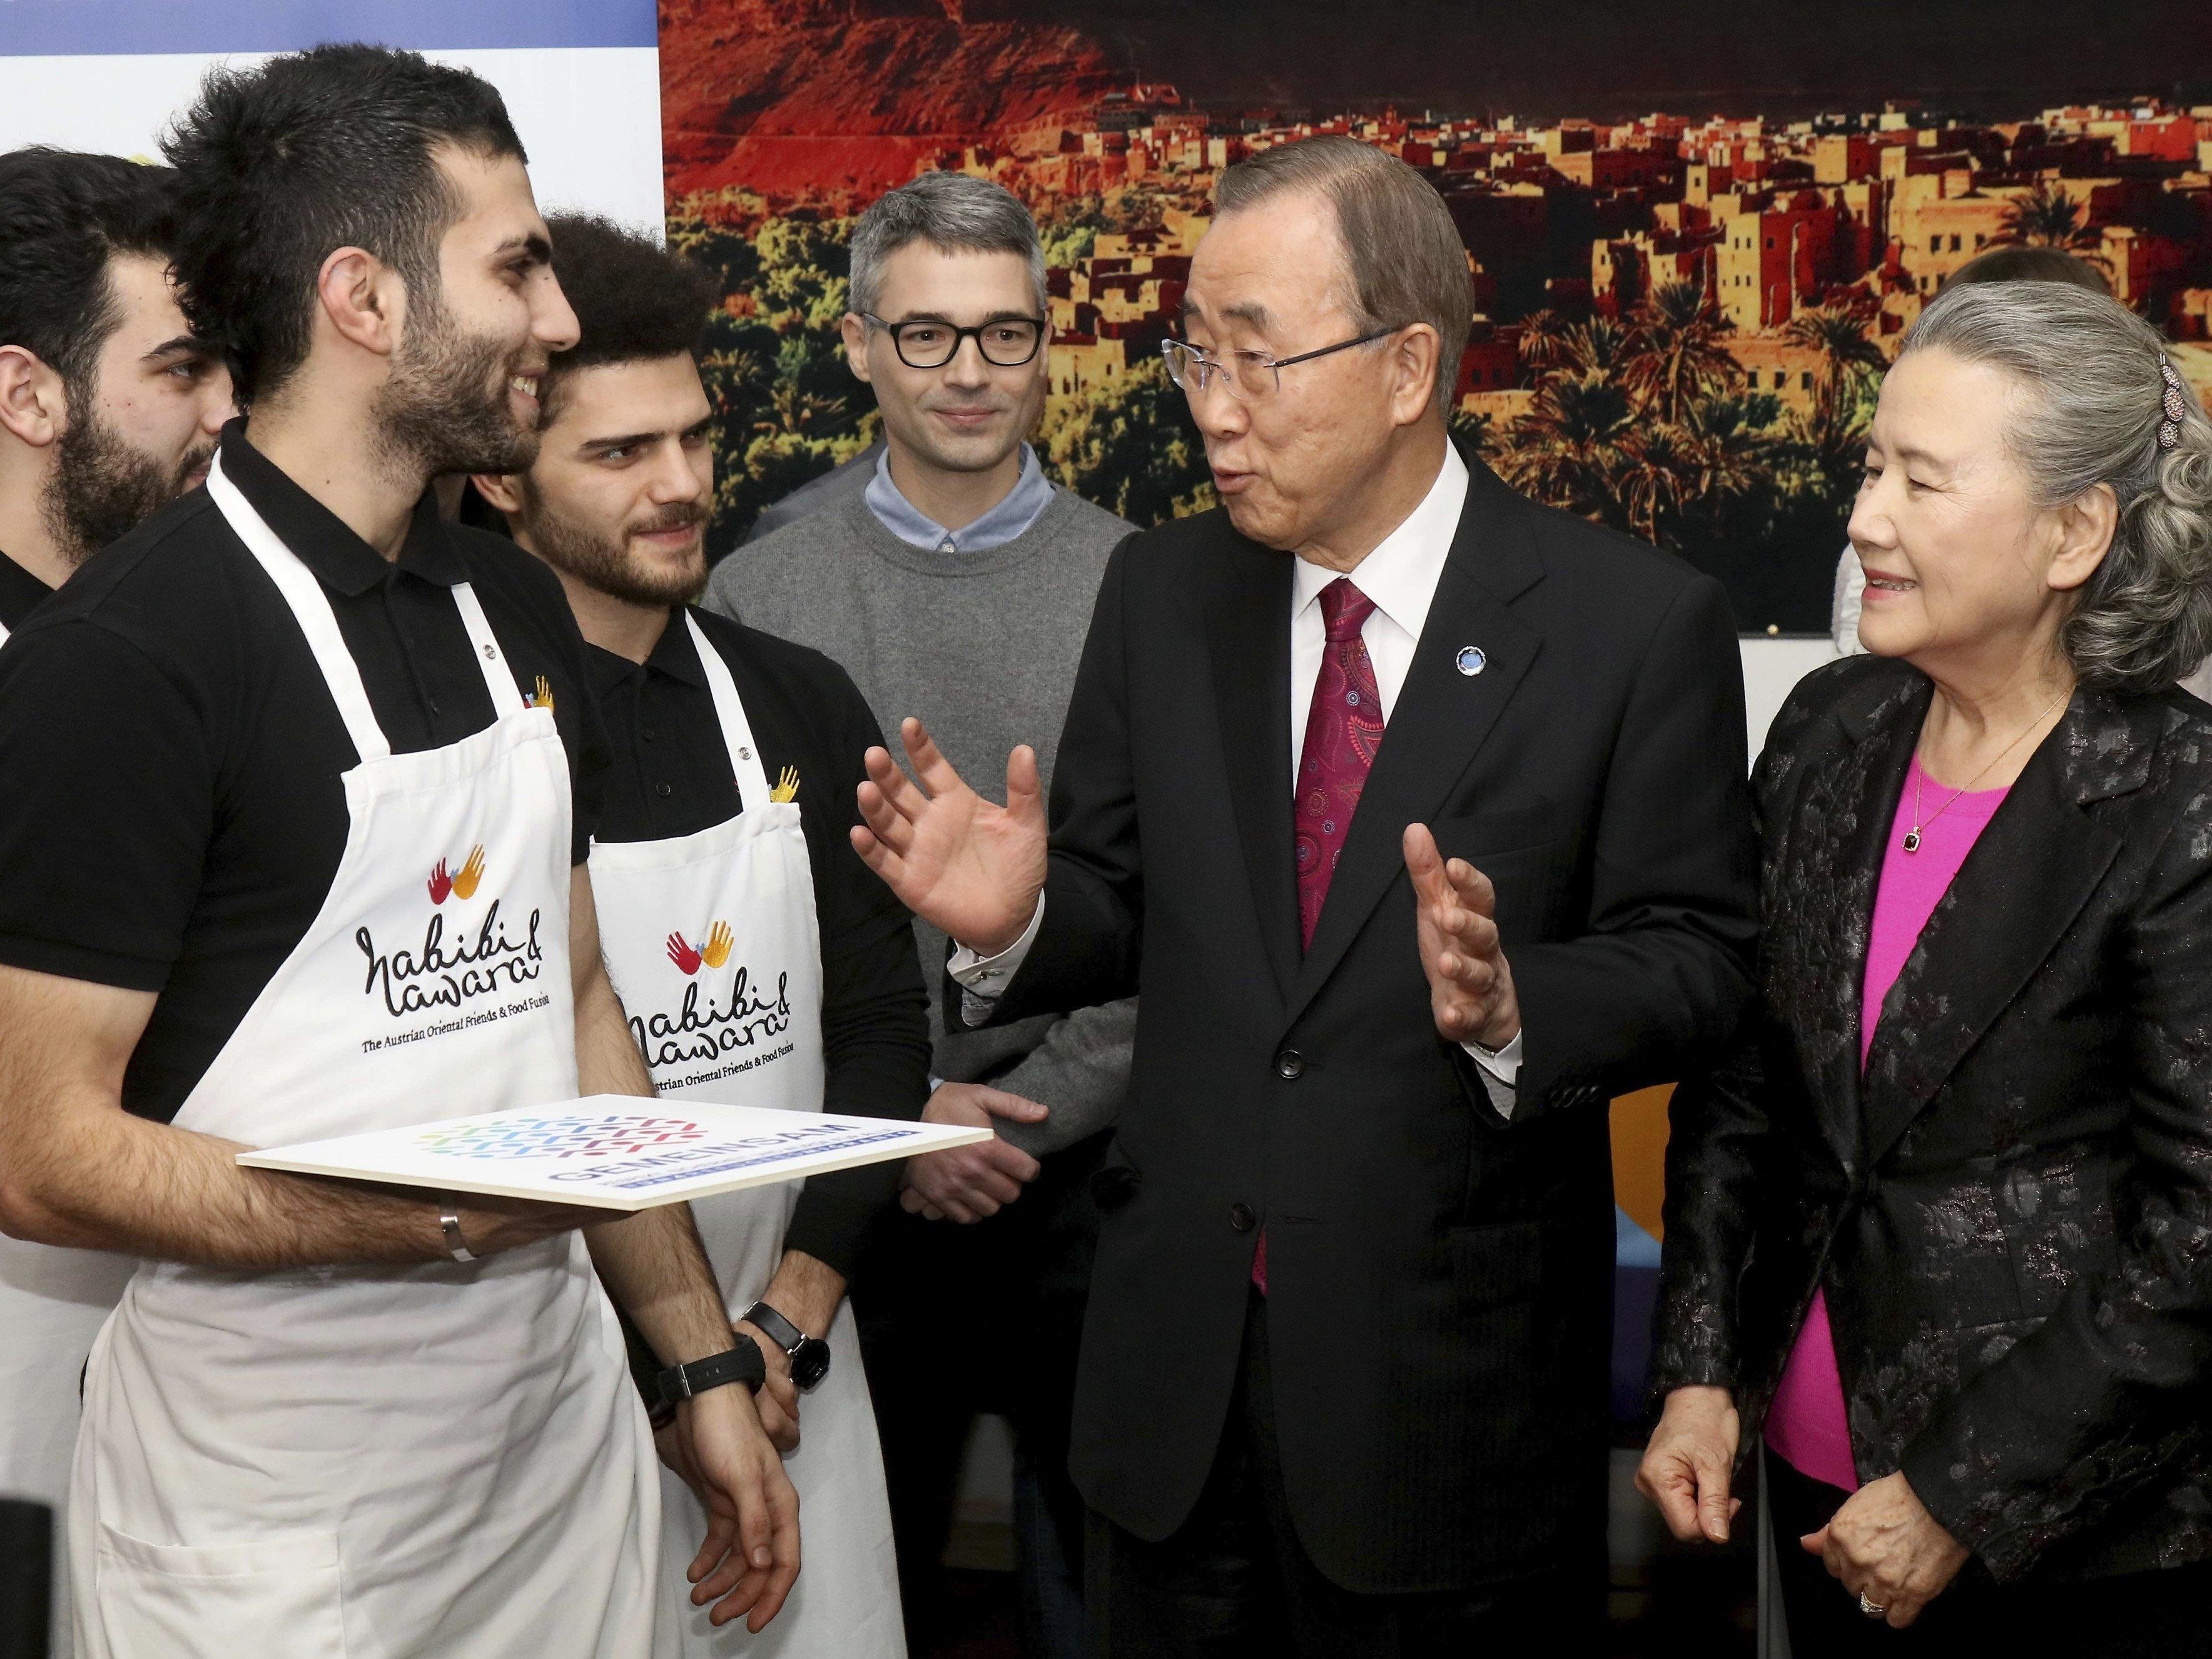 UNO-Generalsekretär Ban Ki-moon besuchte Restaurant Habibi & Hawara in Wien